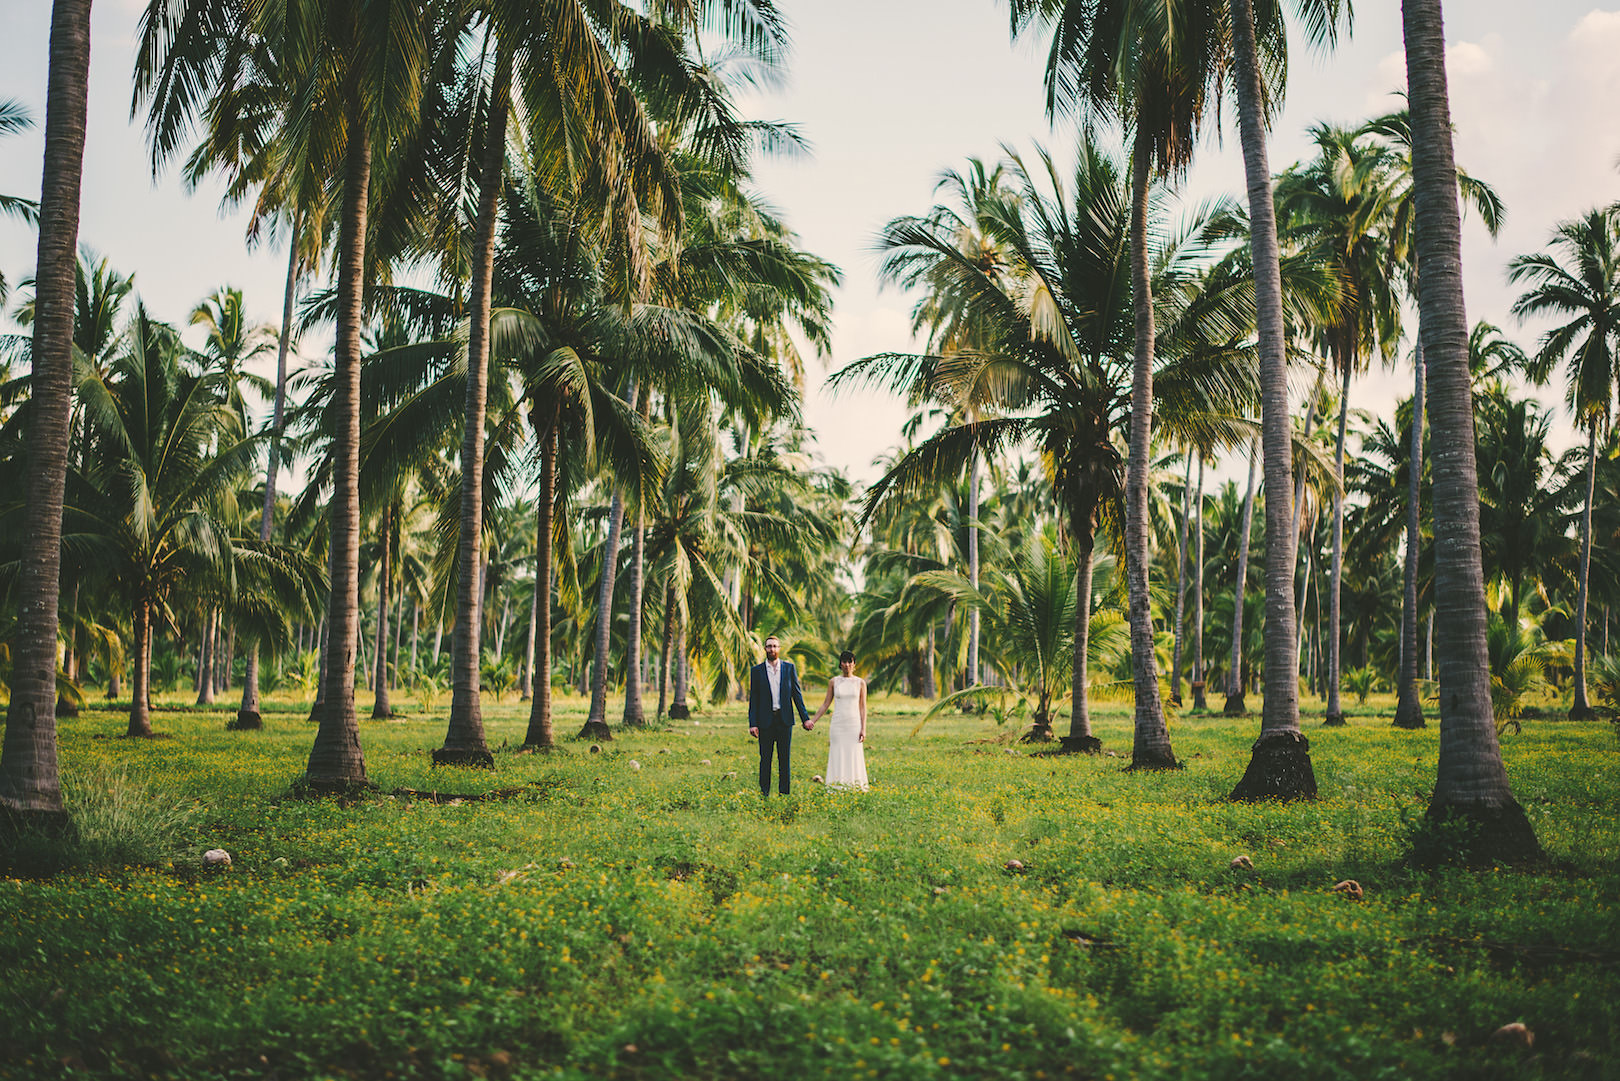 Nathan & Felicia - Wedding Day - © Dallas Kolotylo Photography - 489